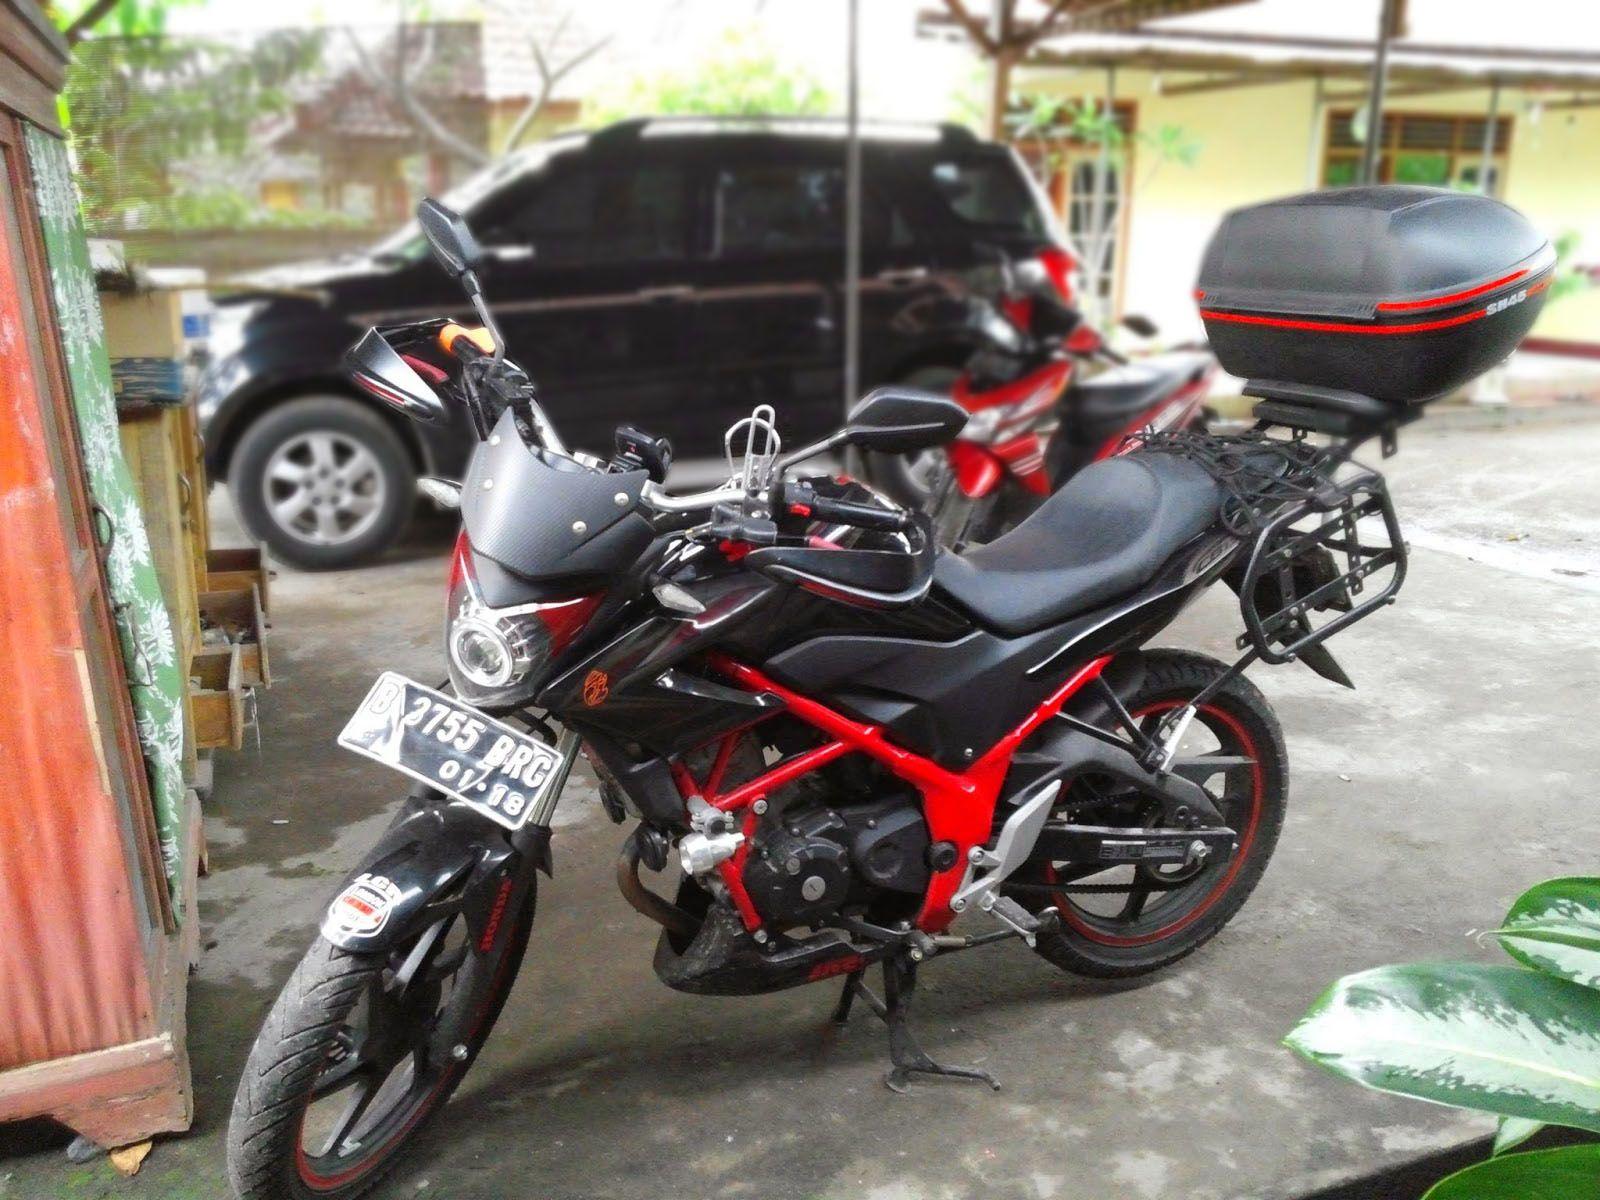 Pin By Yakin Alk On Bike Pinterest Honda Cb And Motorcycle Stang Yamaha Xabre Touring